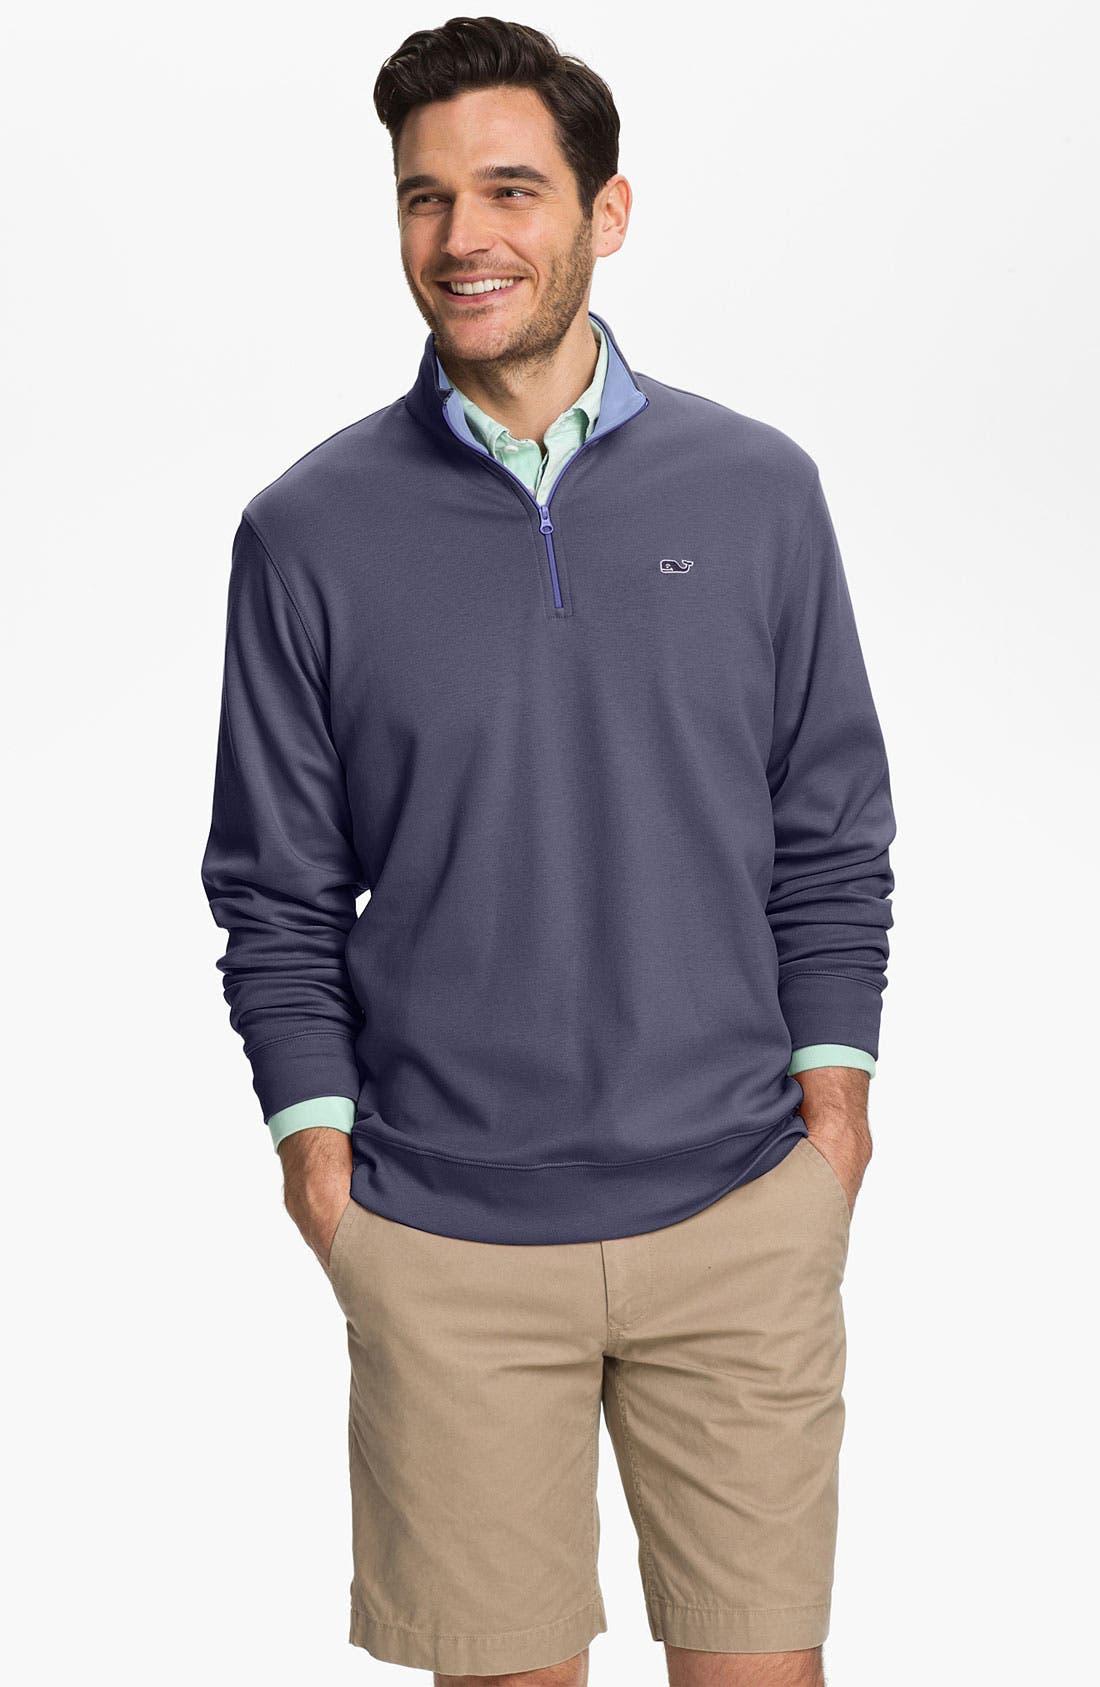 Alternate Image 1 Selected - Vineyard Vines Quarter Zip Sweatshirt